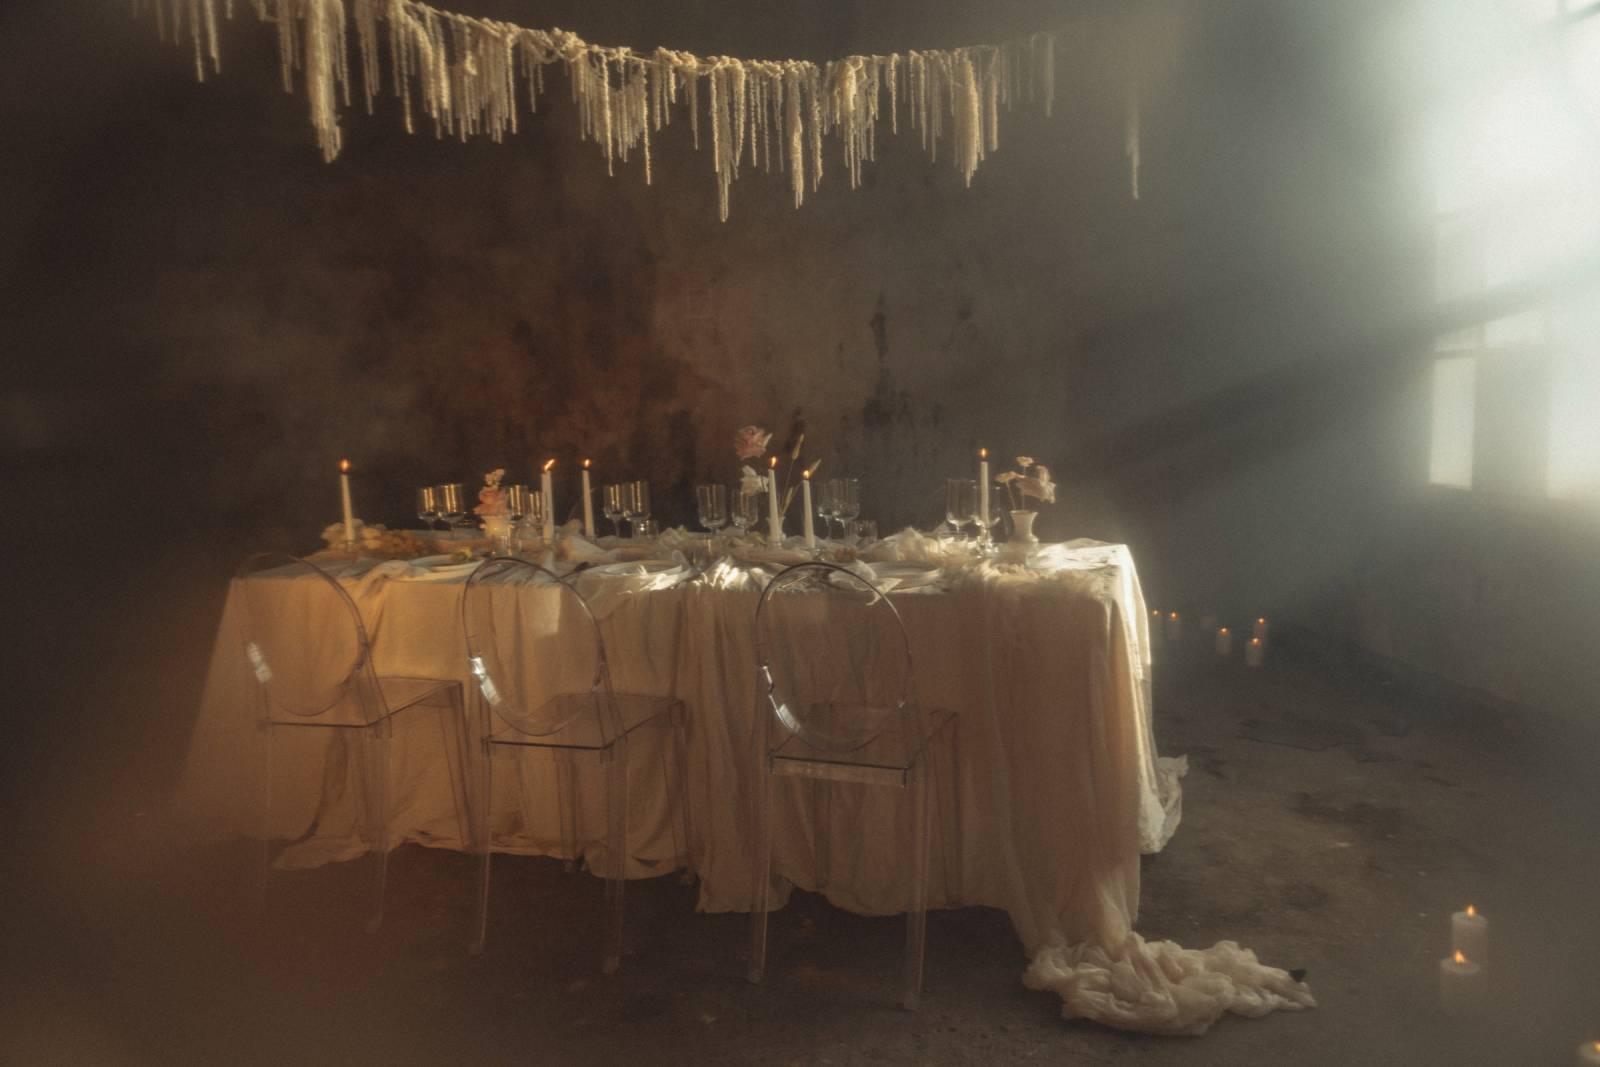 Elien Jansen - Fotograaf - House Of Weddings - 7